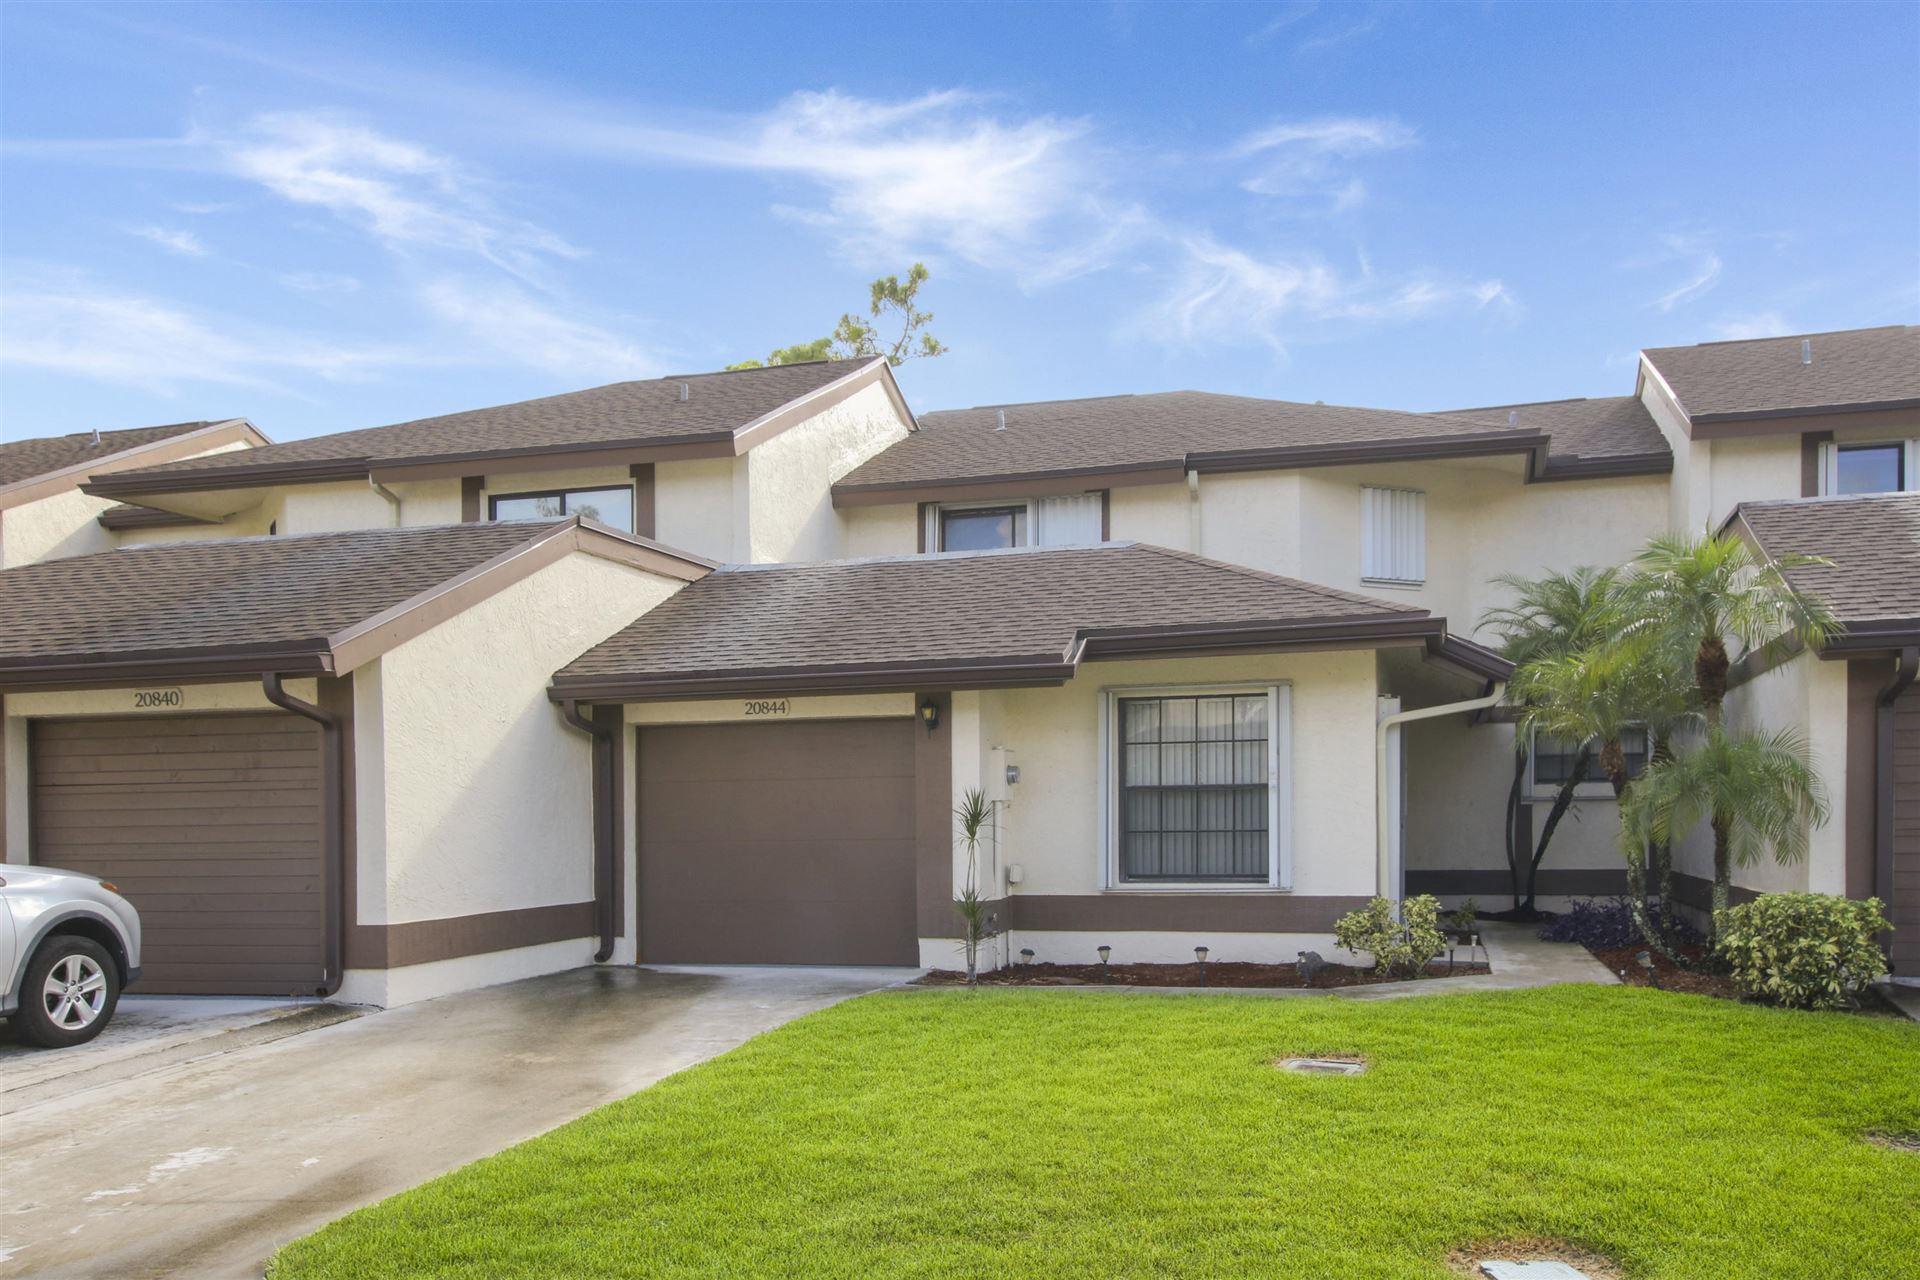 20844 Boca Ridge Drive N, Boca Raton, FL 33428 - #: RX-10650764